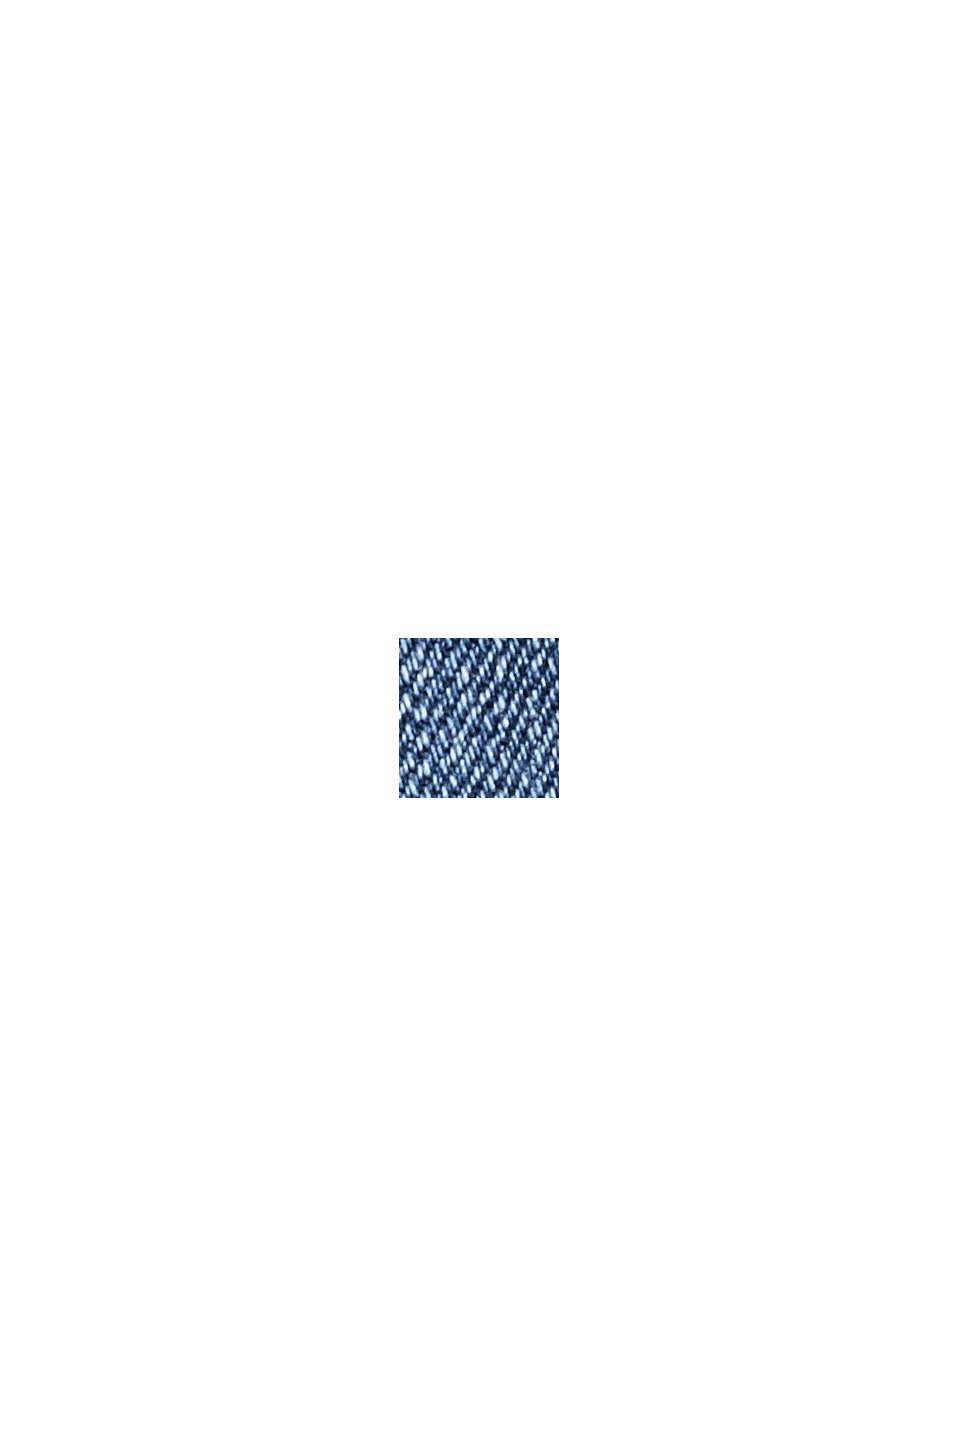 Jeans elasticizzati in cotone biologico, BLUE MEDIUM WASHED, swatch